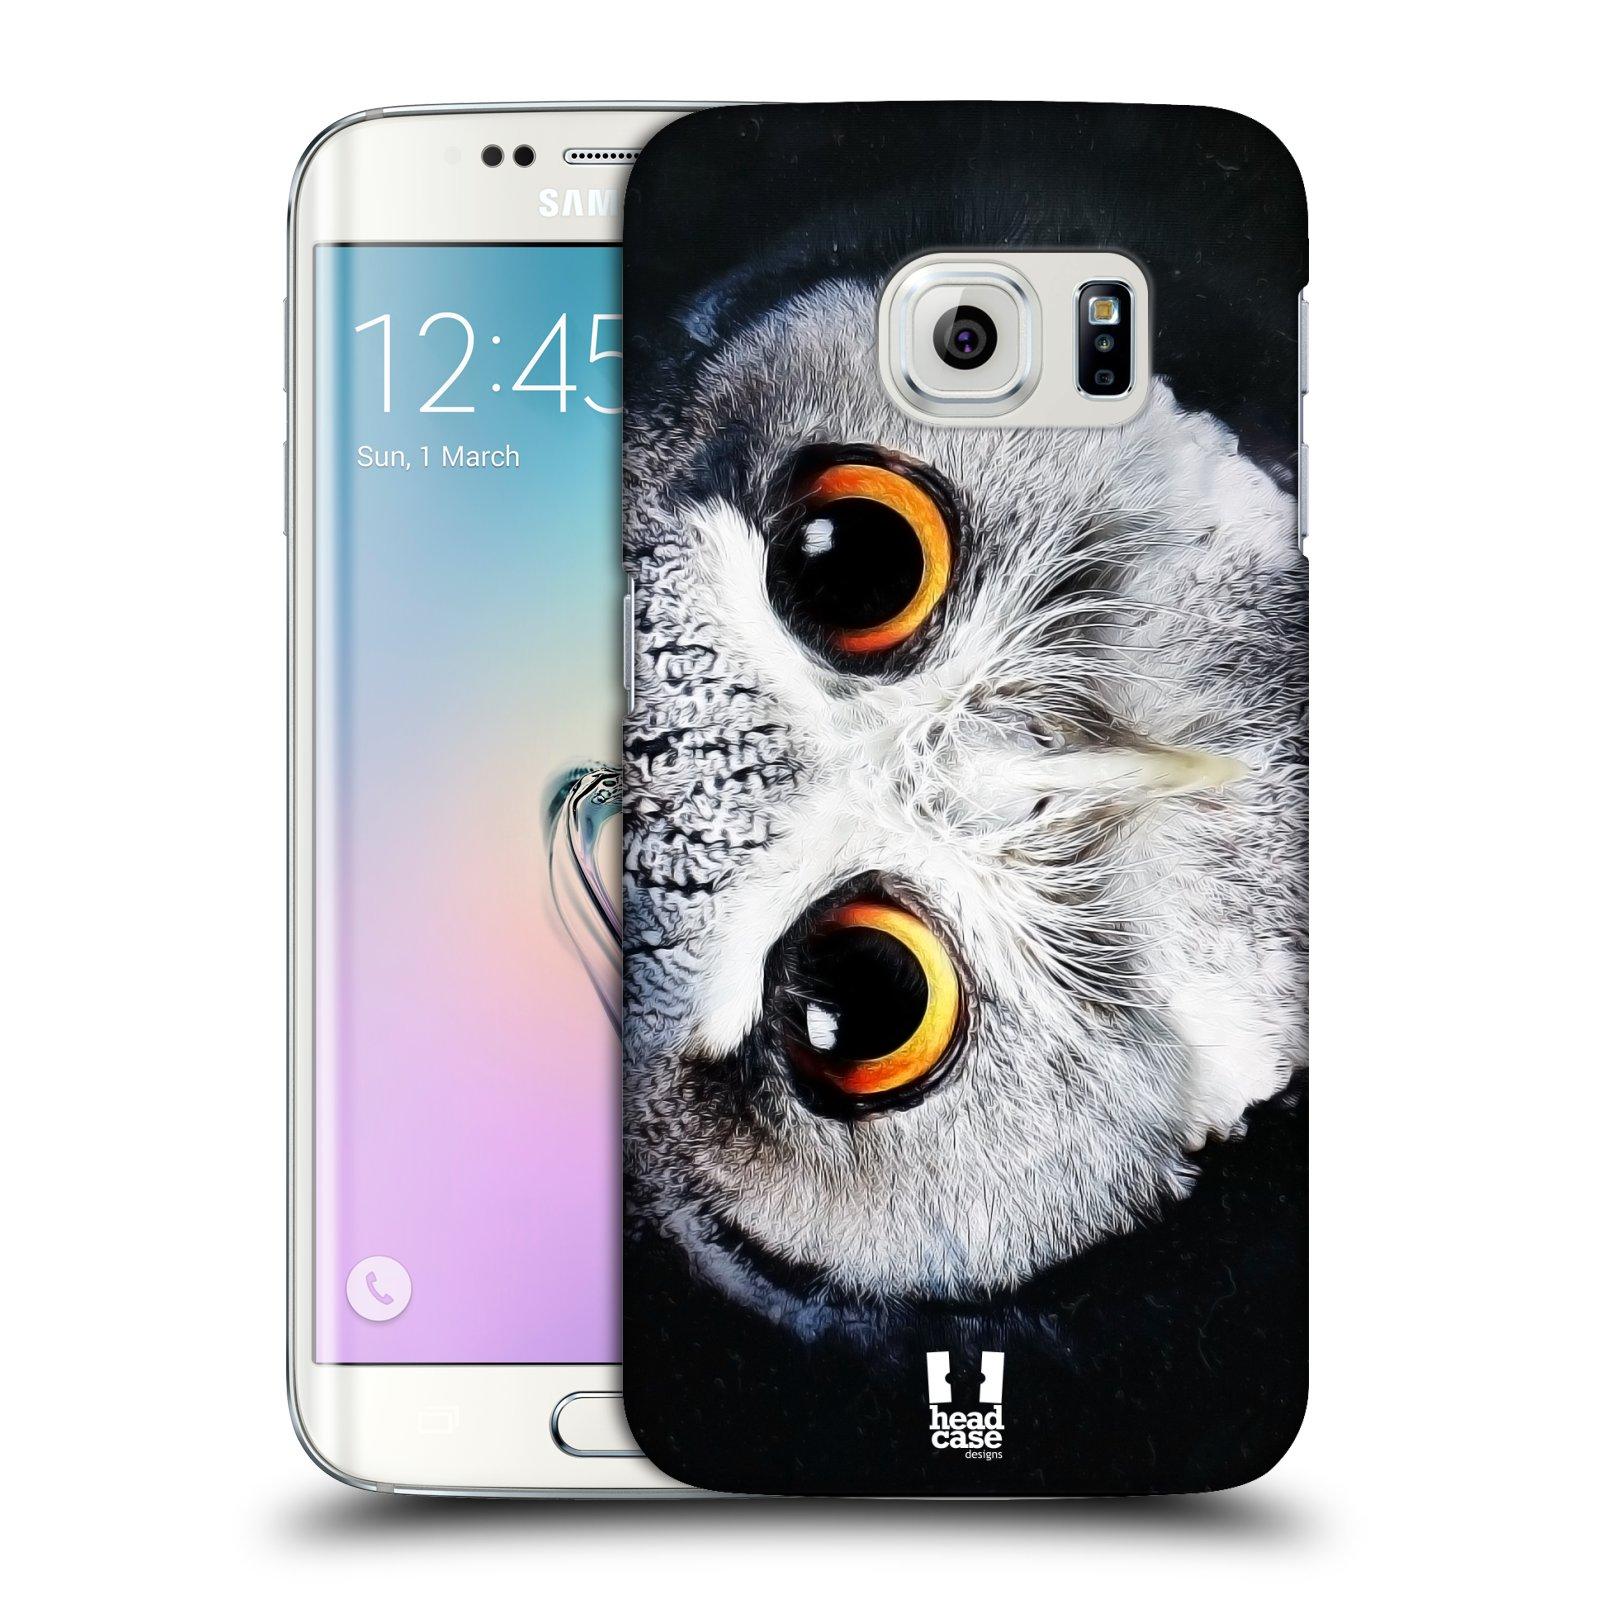 HEAD CASE plastový obal na mobil SAMSUNG Galaxy S6 EDGE (G9250, G925, G925F) vzor Zvířecí tváře sova